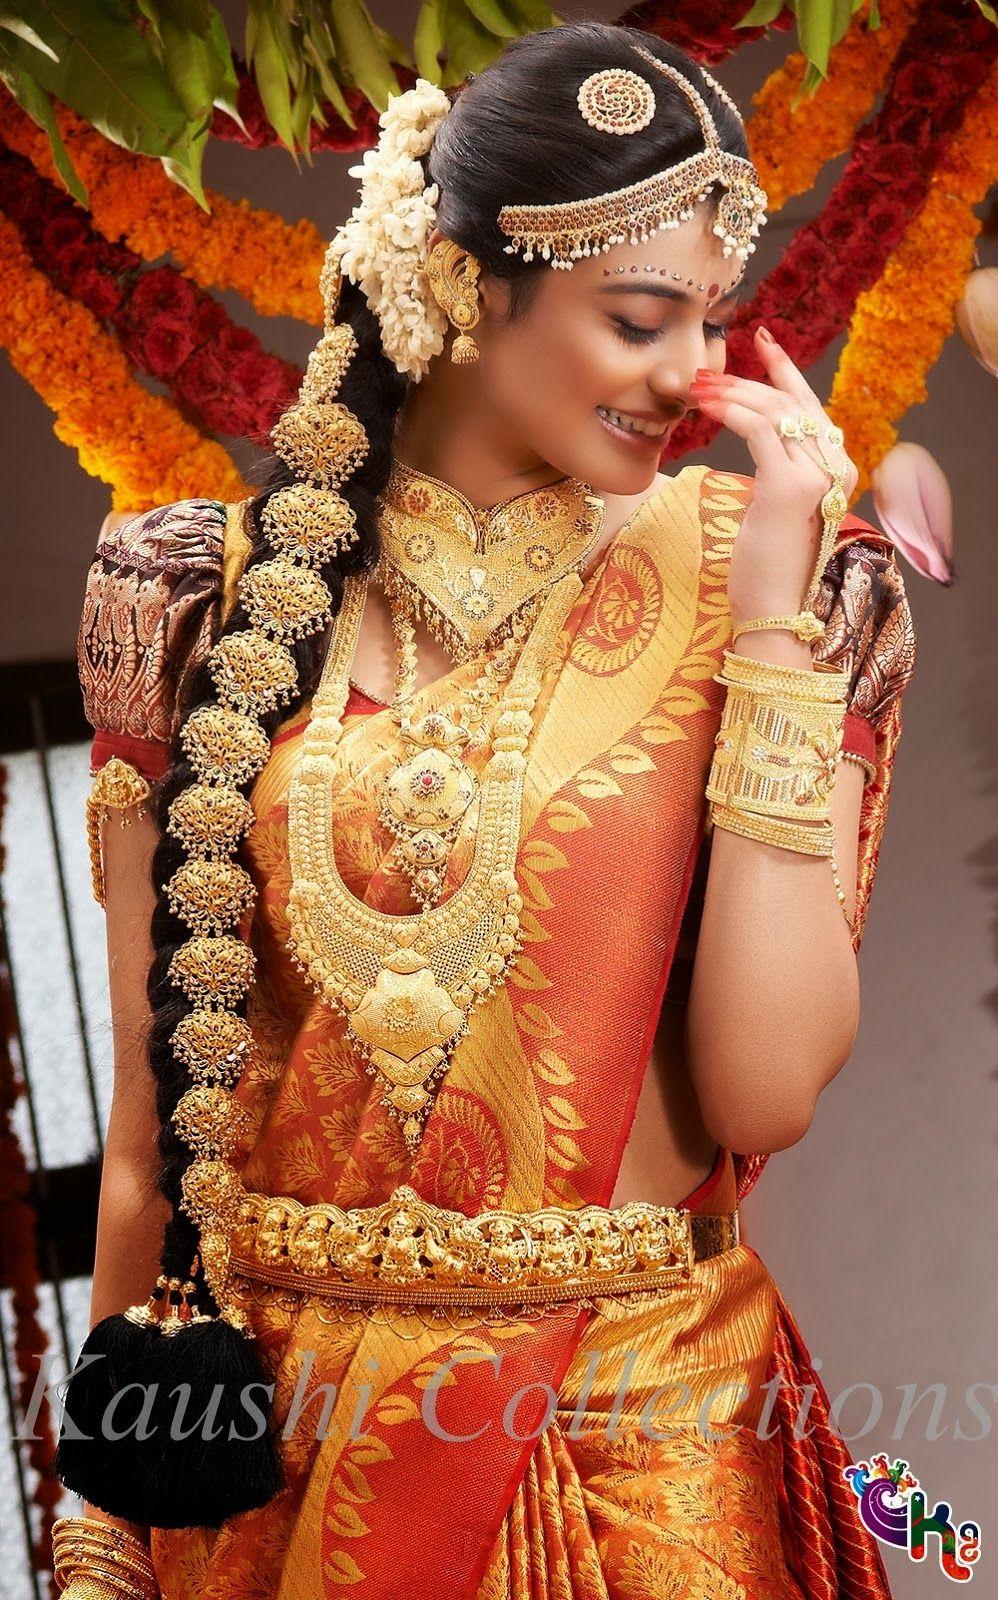 df7c35f64f Kaushi Collections: How to choose Wedding sarees | Women's Wedding ...